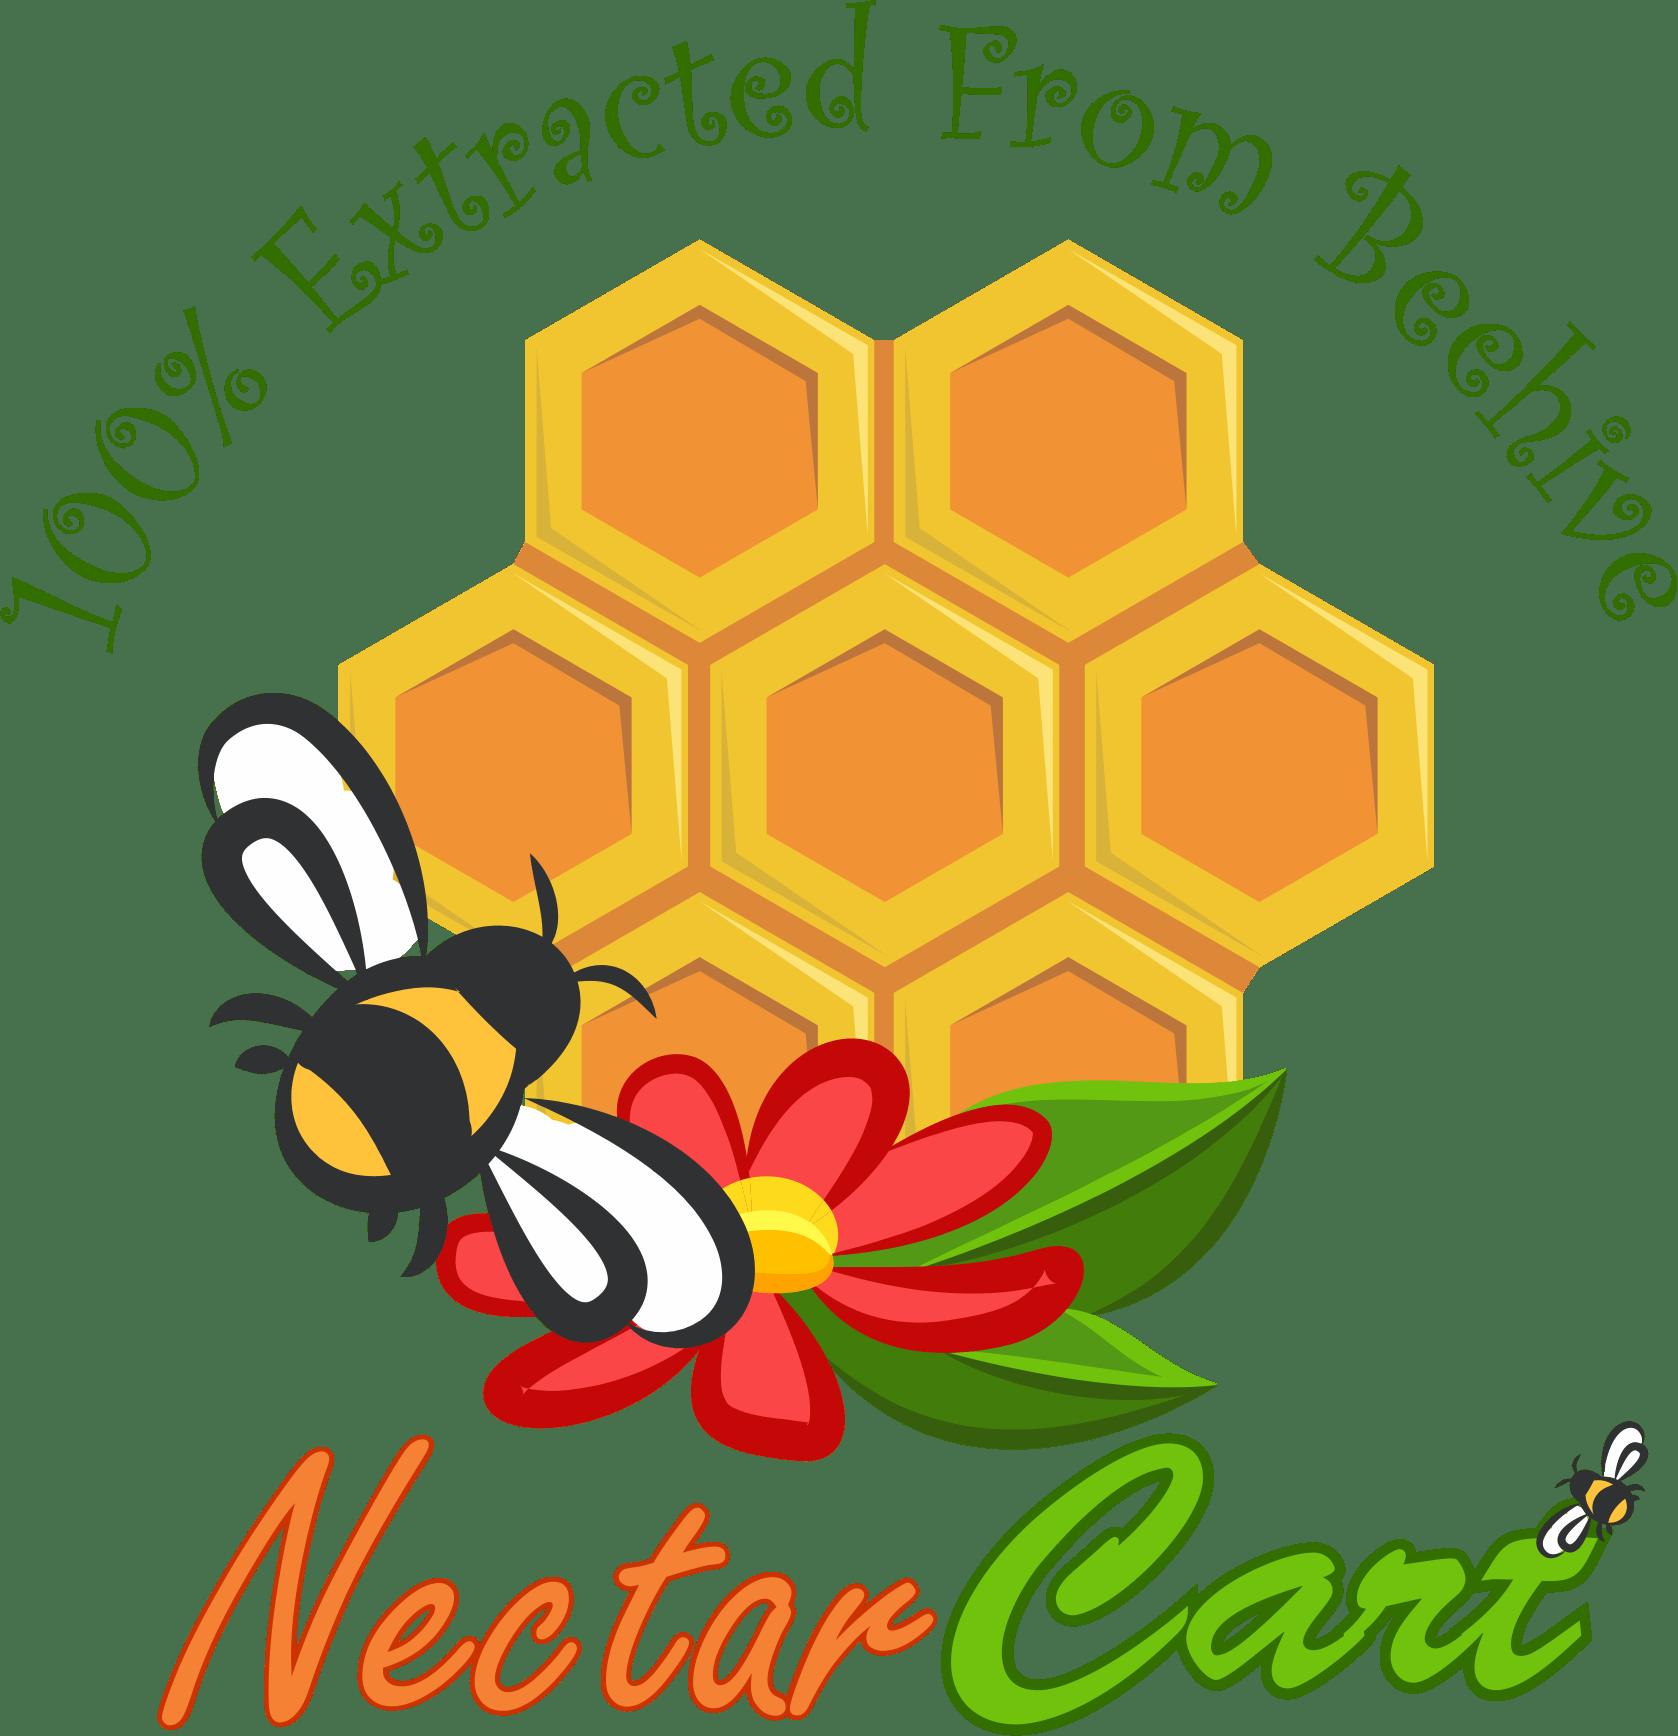 Nectarcart